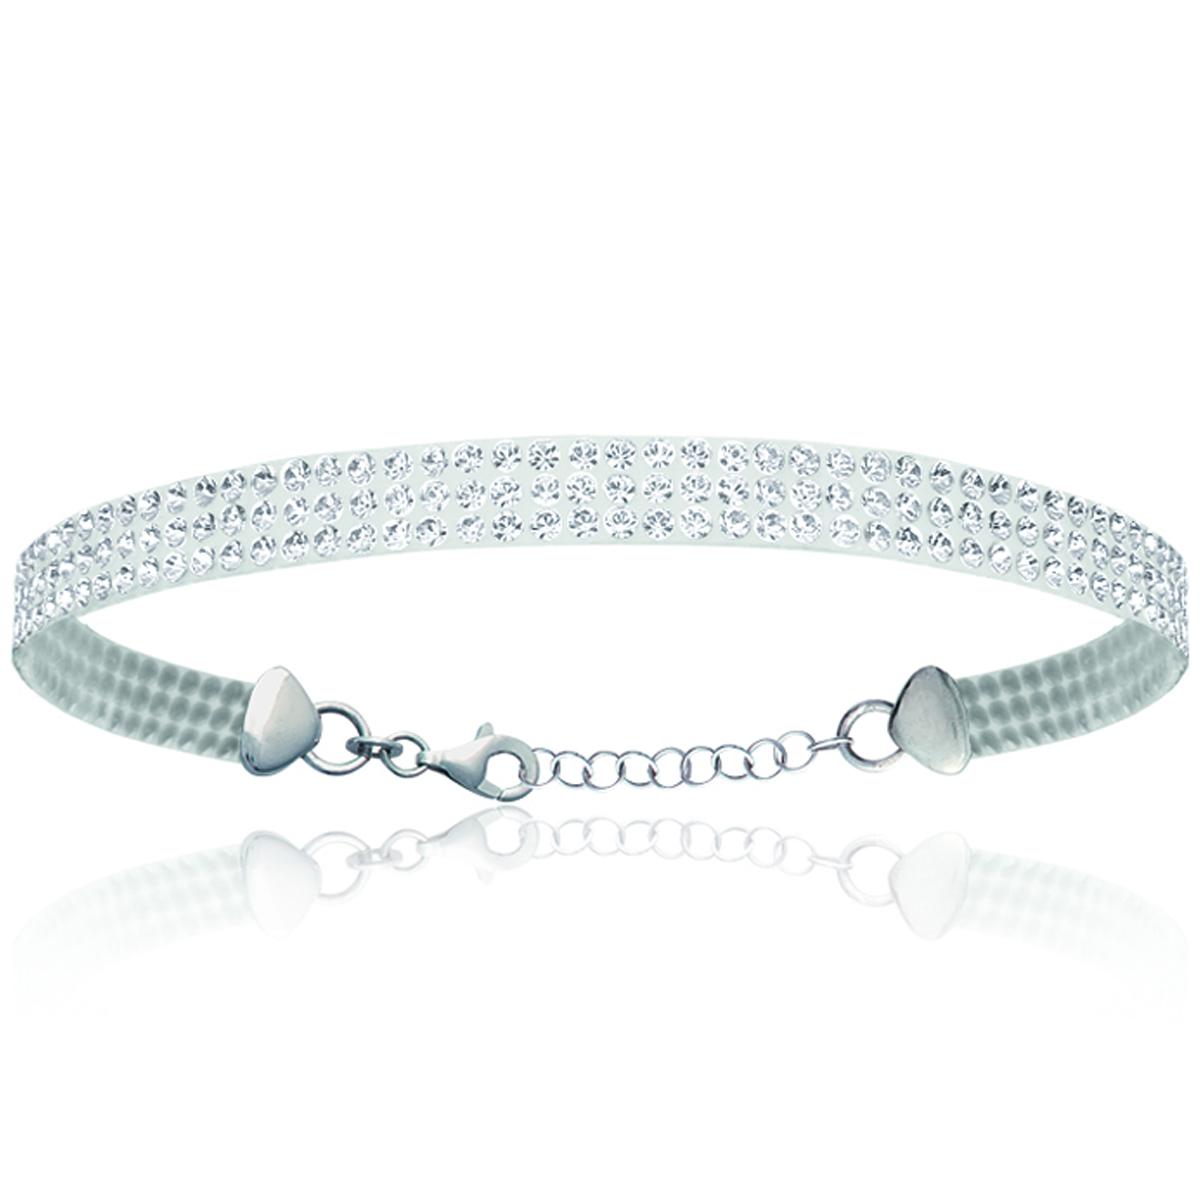 Bracelet Argent \'Sissi\' blanc cristal - 19 cm 6 mm - [M7325]